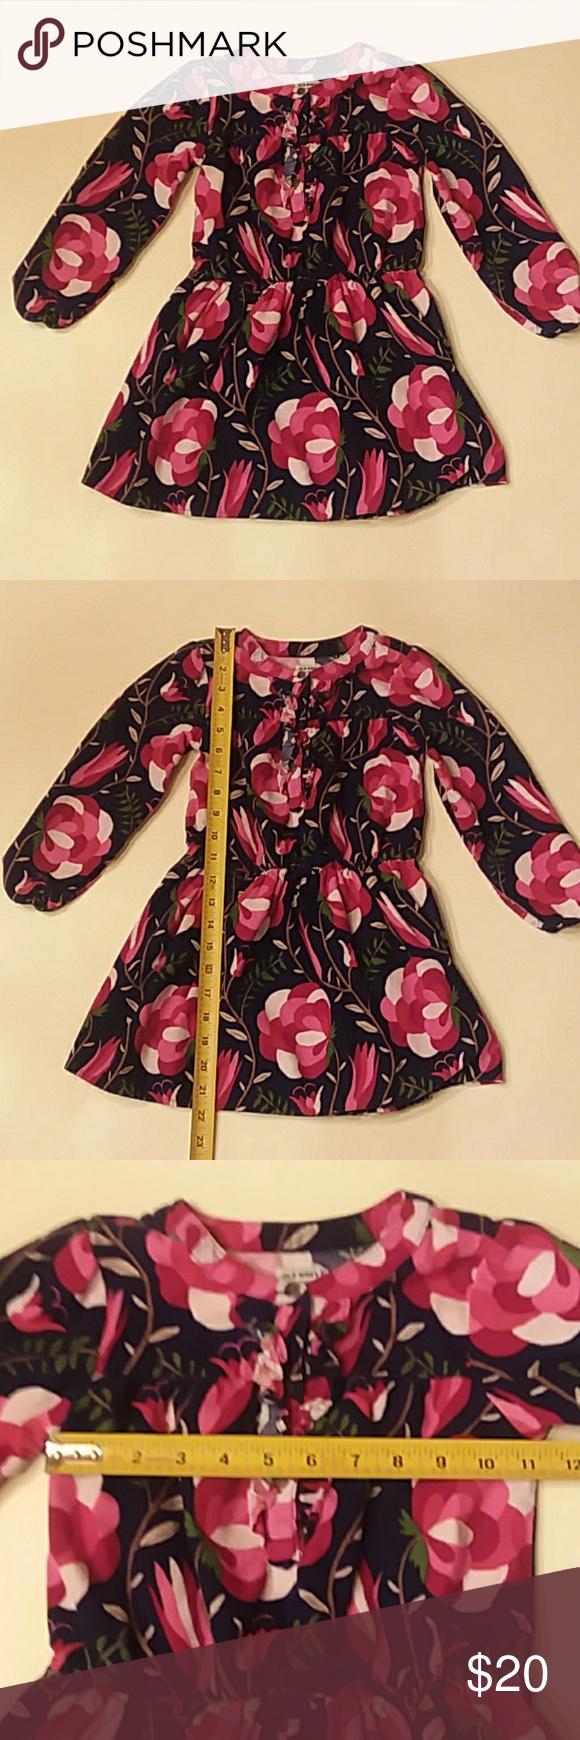 Old Navy 5t Pink Floral Corduroy Long Sleeve Dress Old Navy Size 5t Pink And Navy Blue Floral Corduroy Long Sl Long Sleeve Dress Kids Dresses Colorful Dresses [ 1740 x 580 Pixel ]